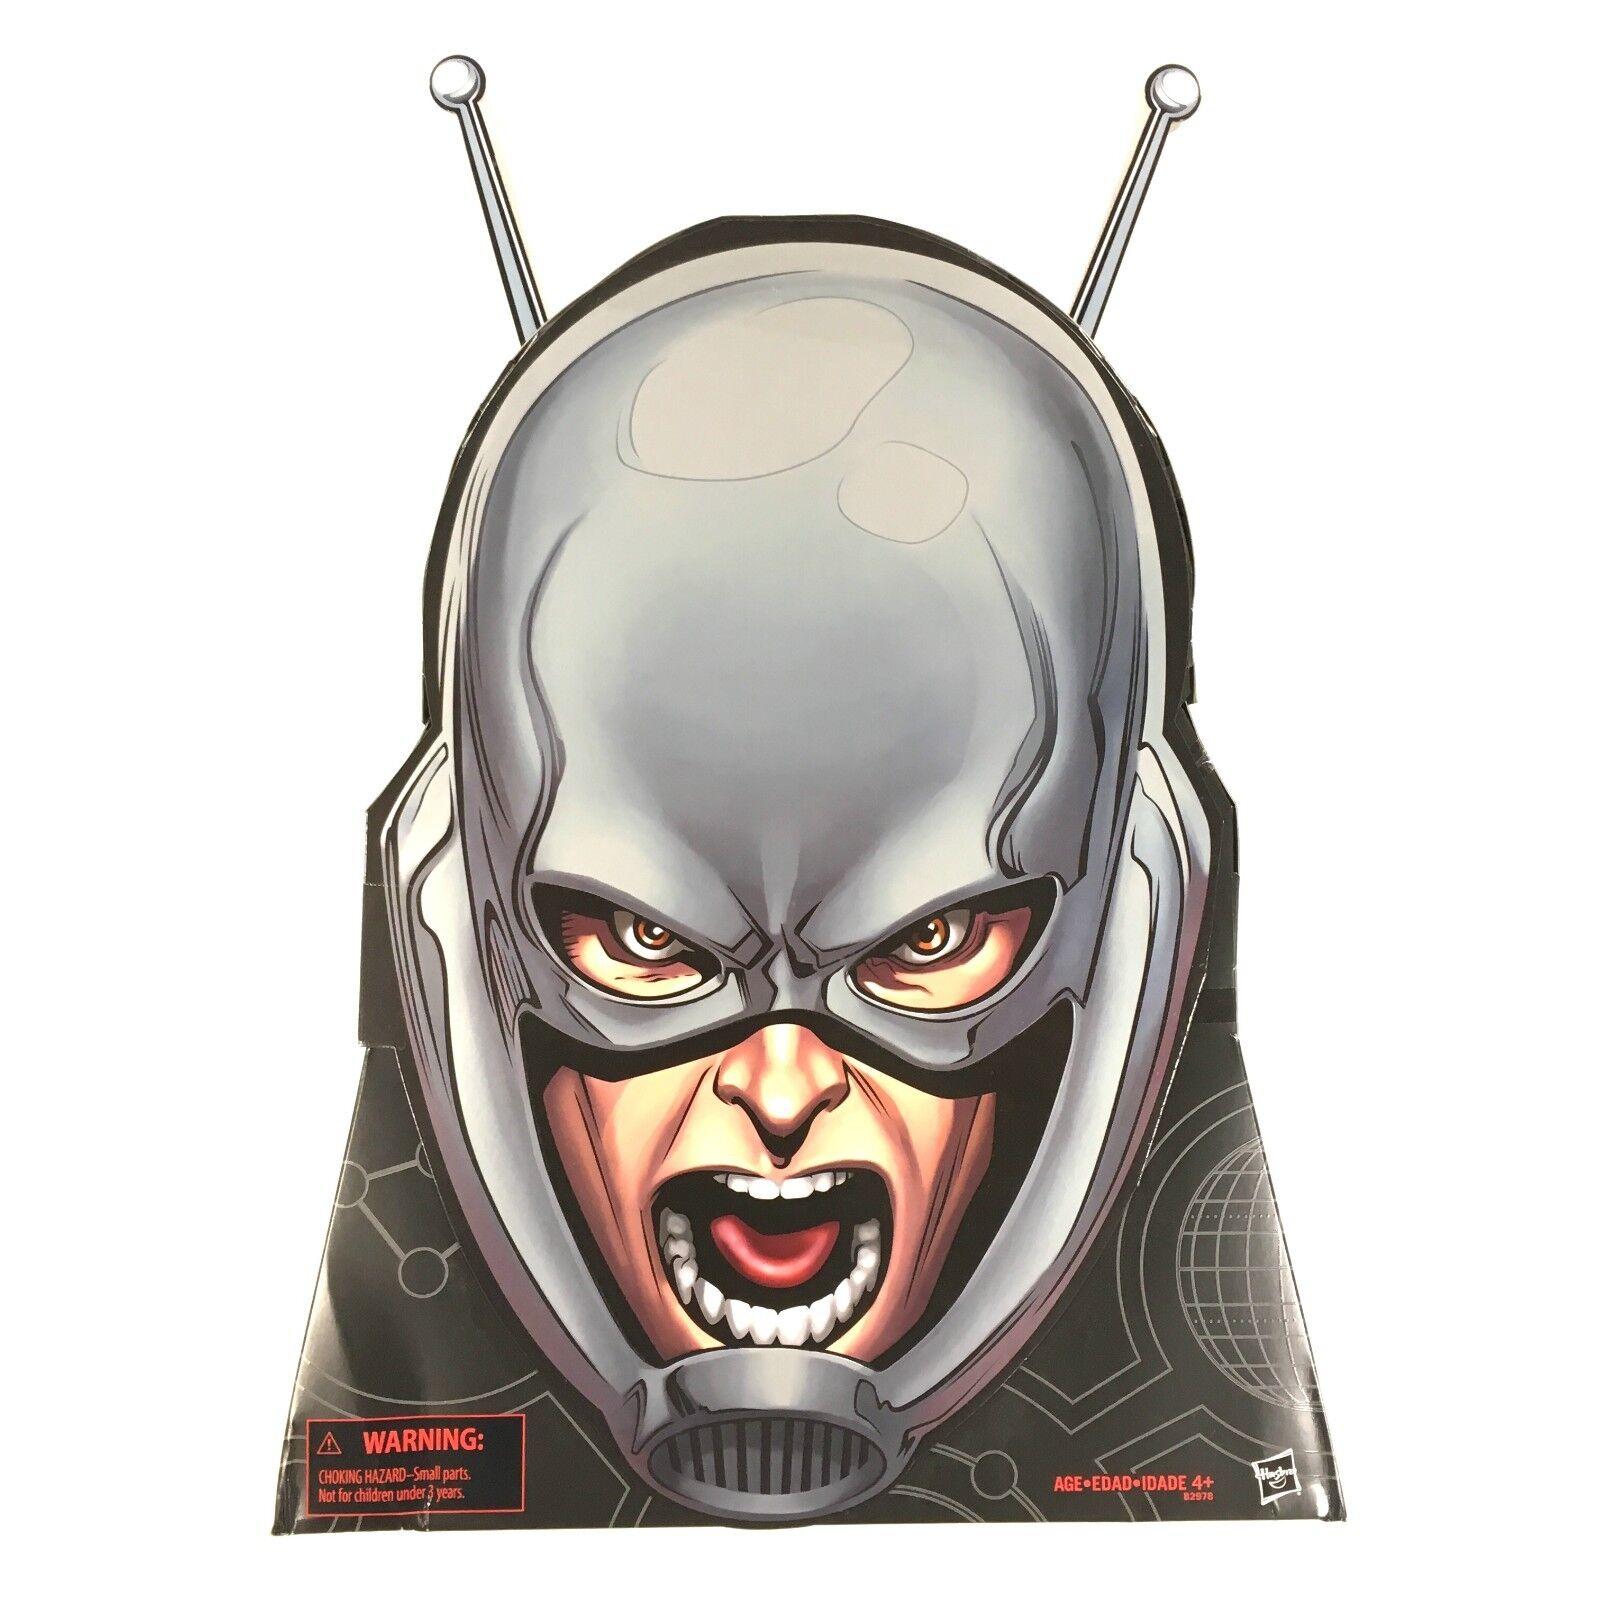 Marvel Legends 2015 SDCC Ant-Man Box Set  Giant-Man Goliath Hank Pym Scott Lang